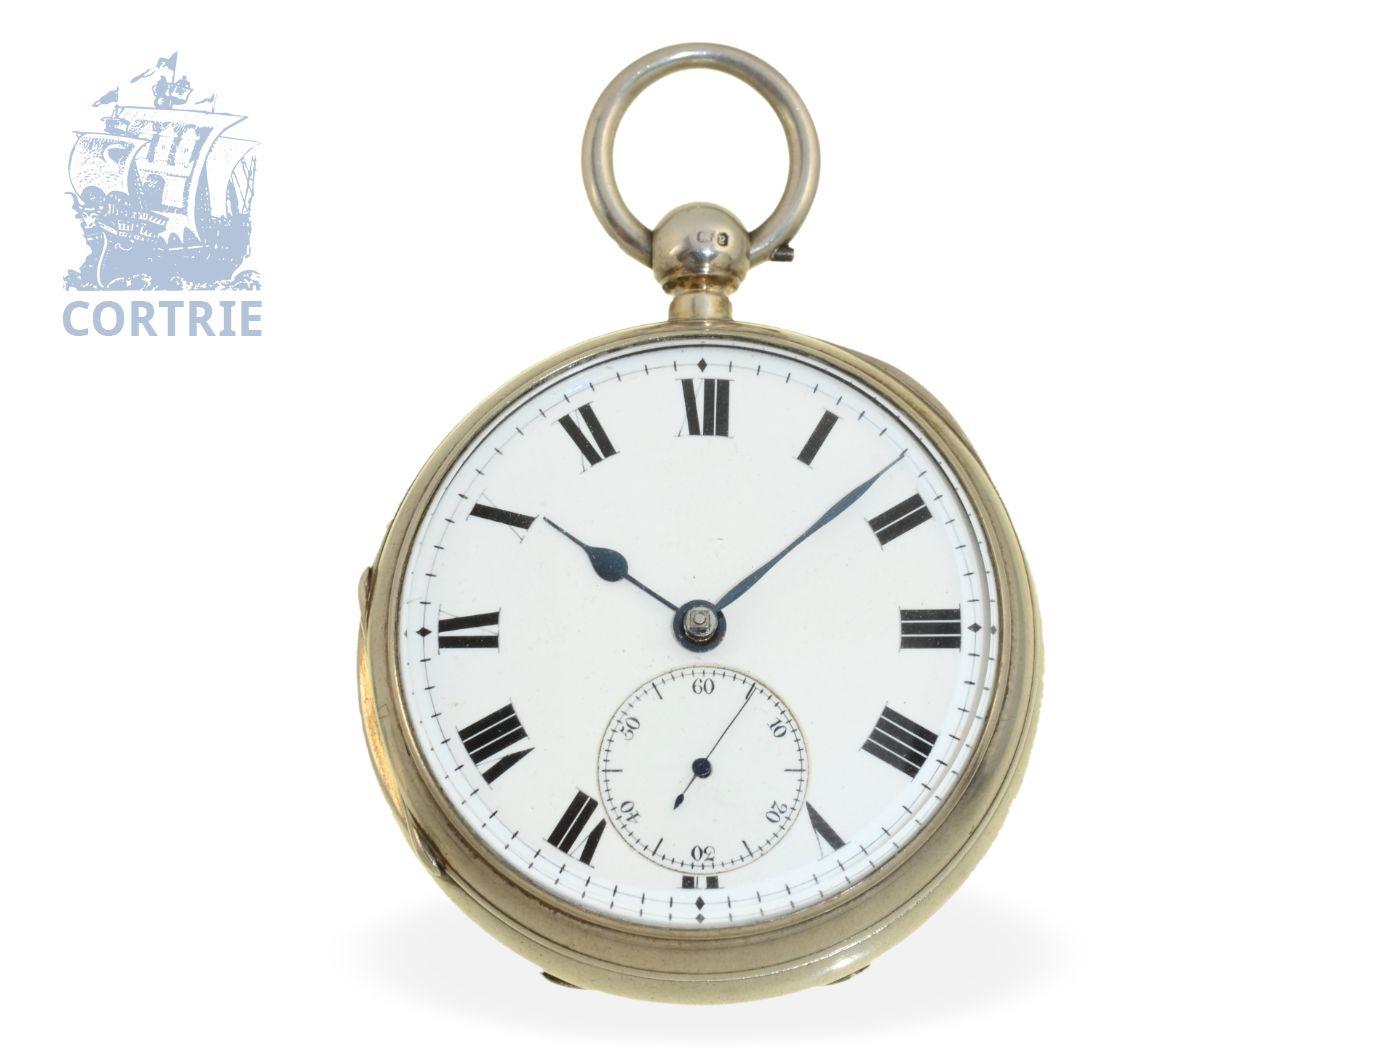 Pocket watch: English pocket watch chronometer, John Arnold & Son London No.19672-